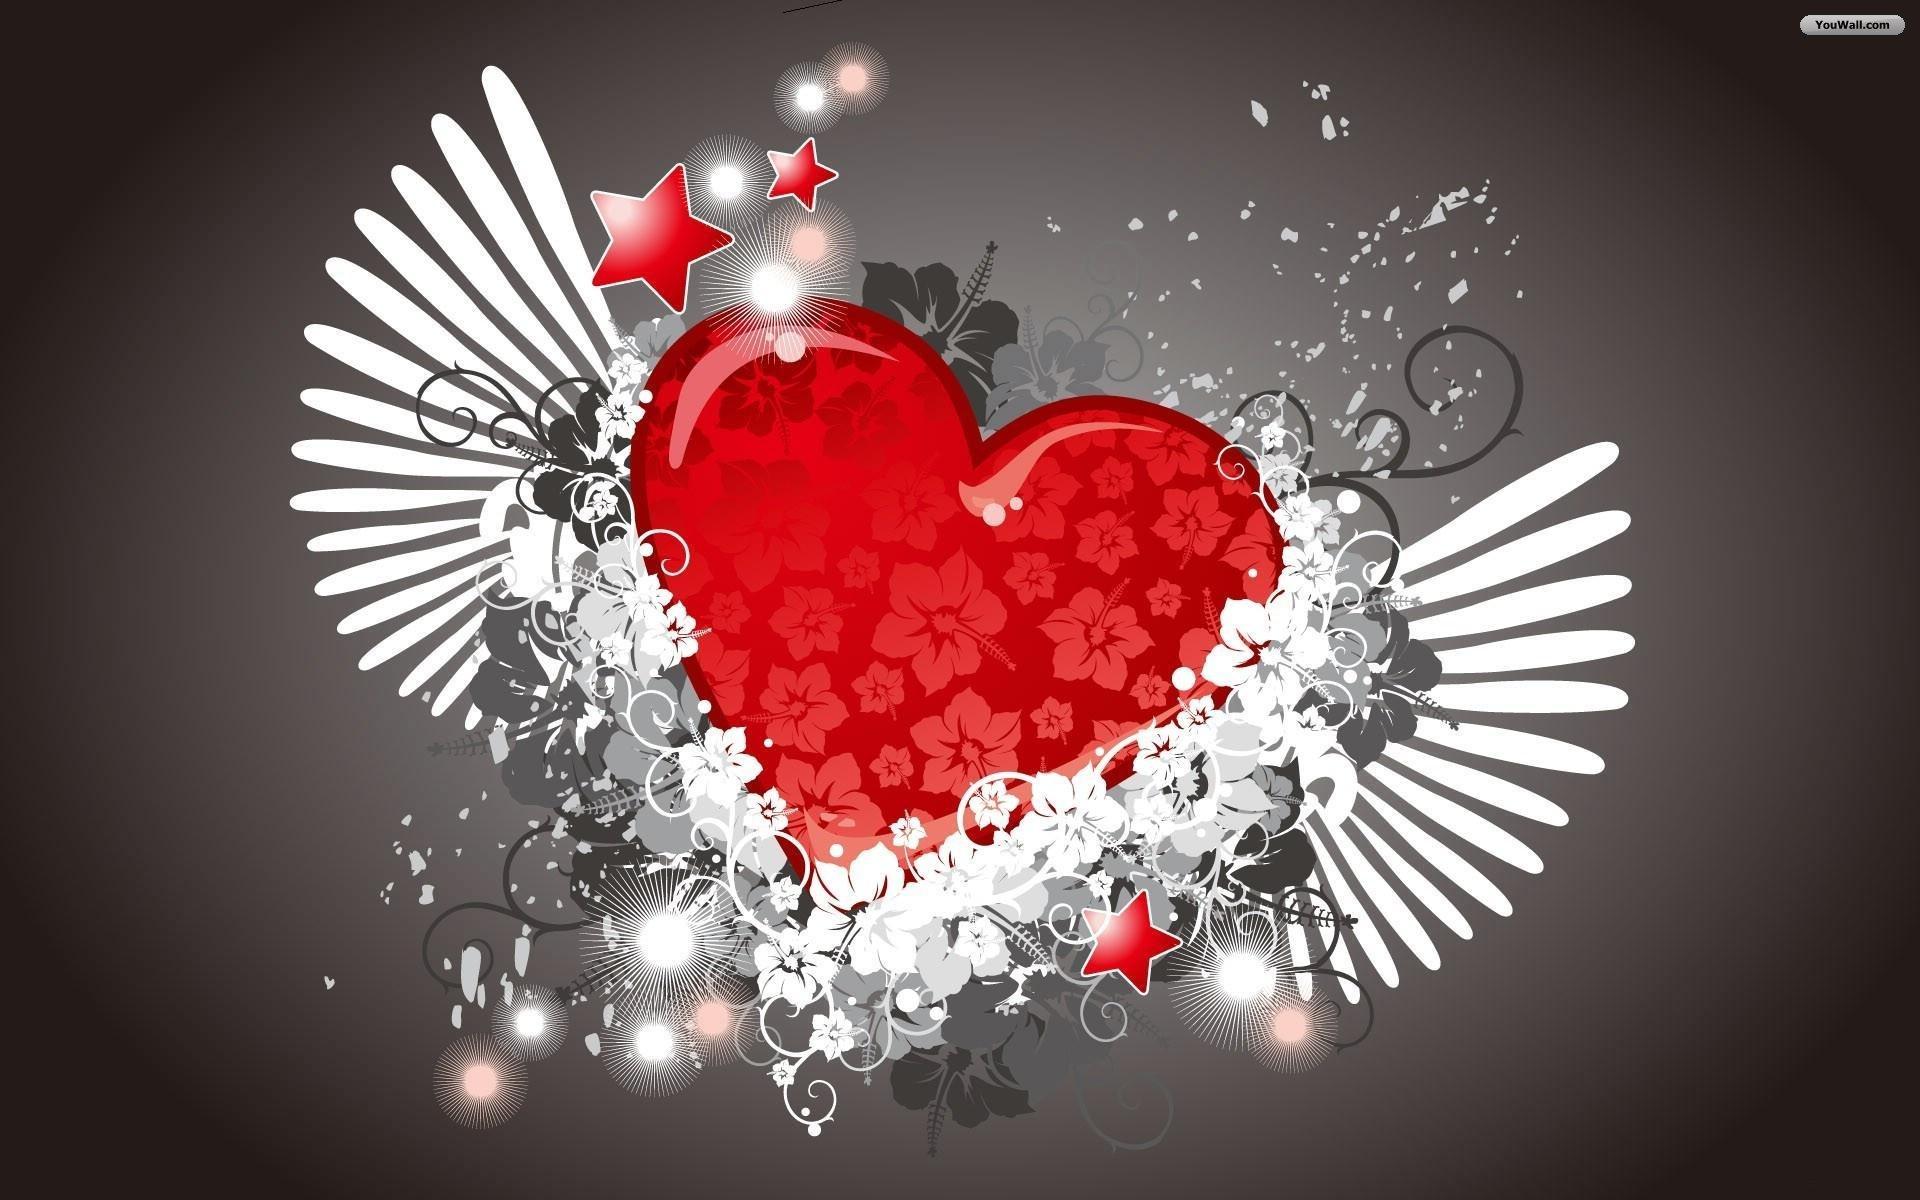 Free Love Heart Image Animated Love Heart 11551